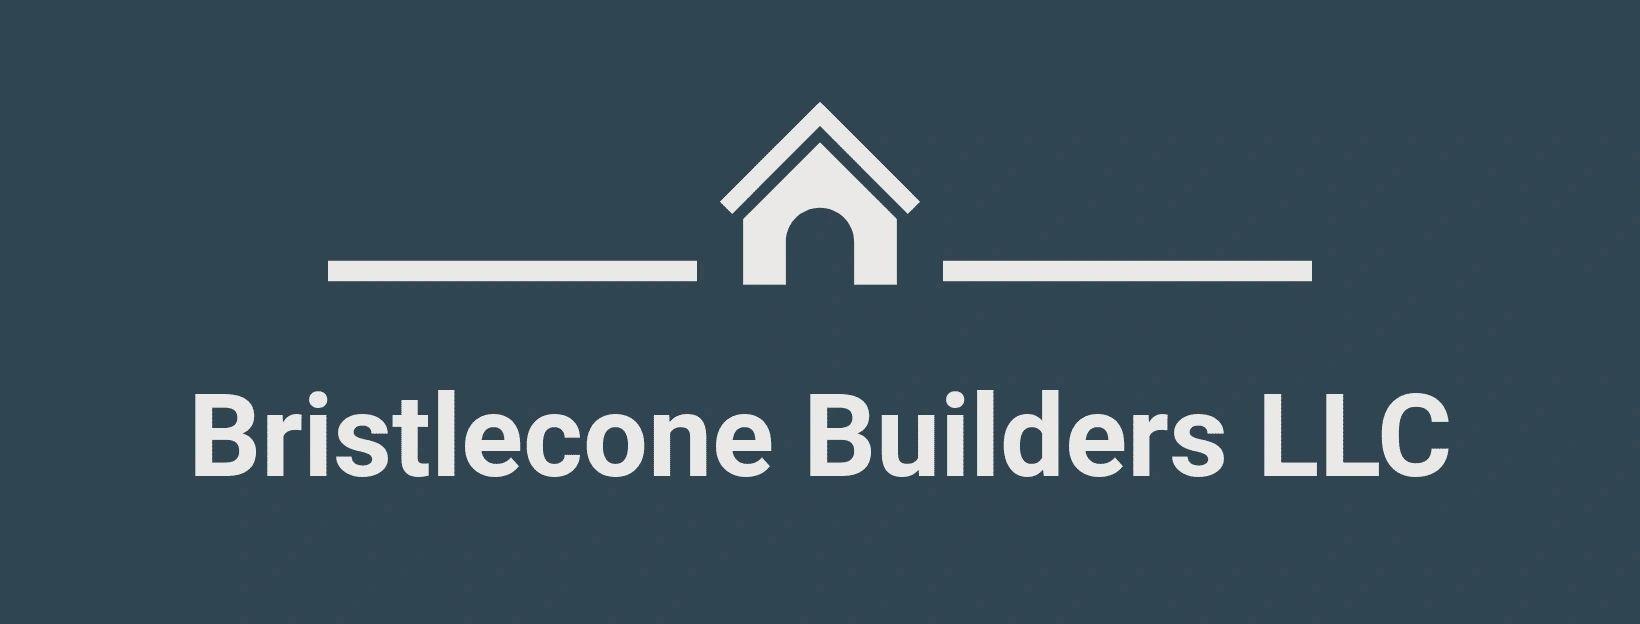 Bristlecone Builders LLC logo